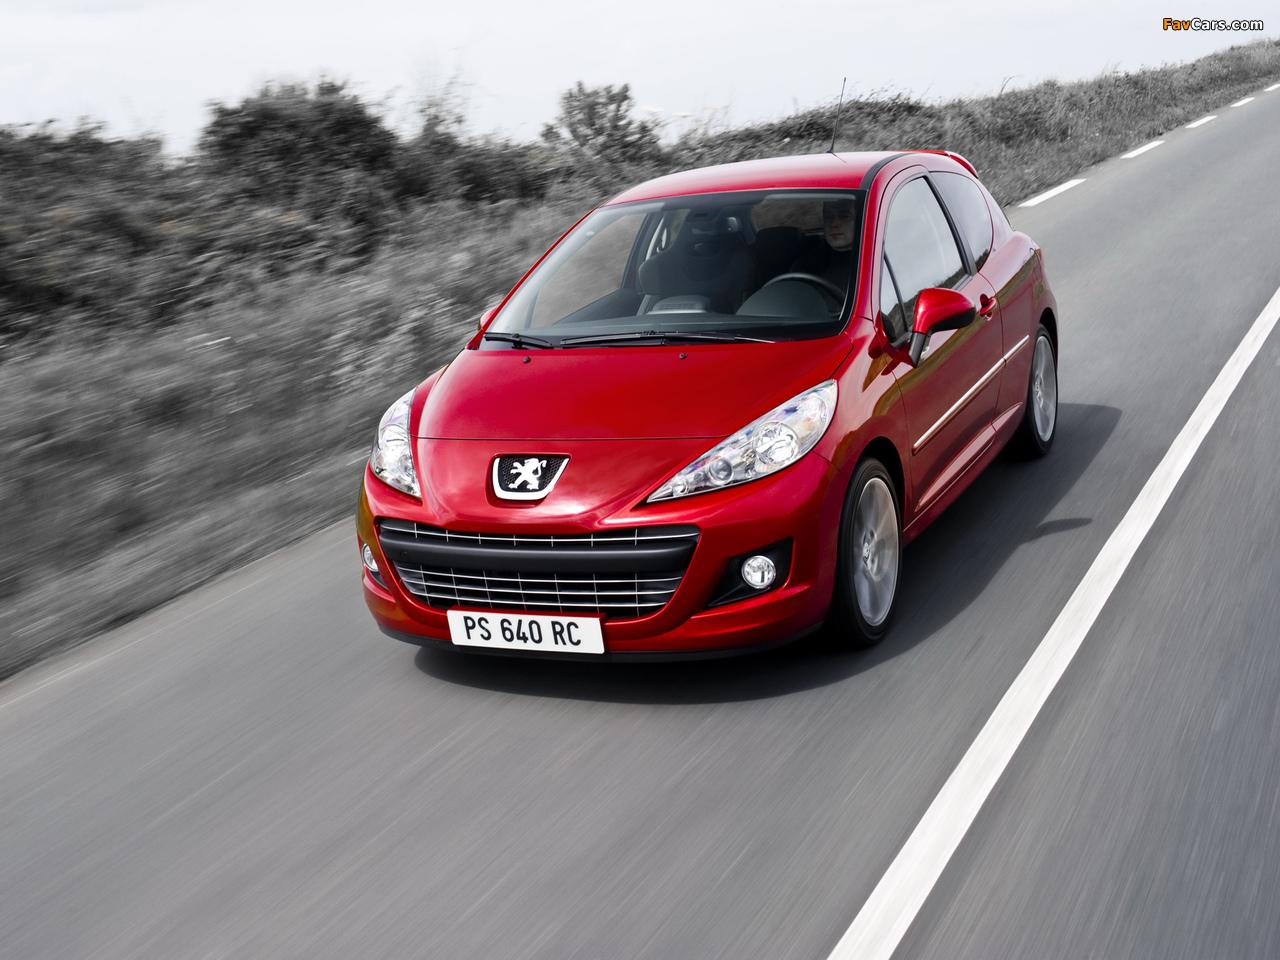 Photos of Peugeot 207 RC 2009 (1280 x 960)